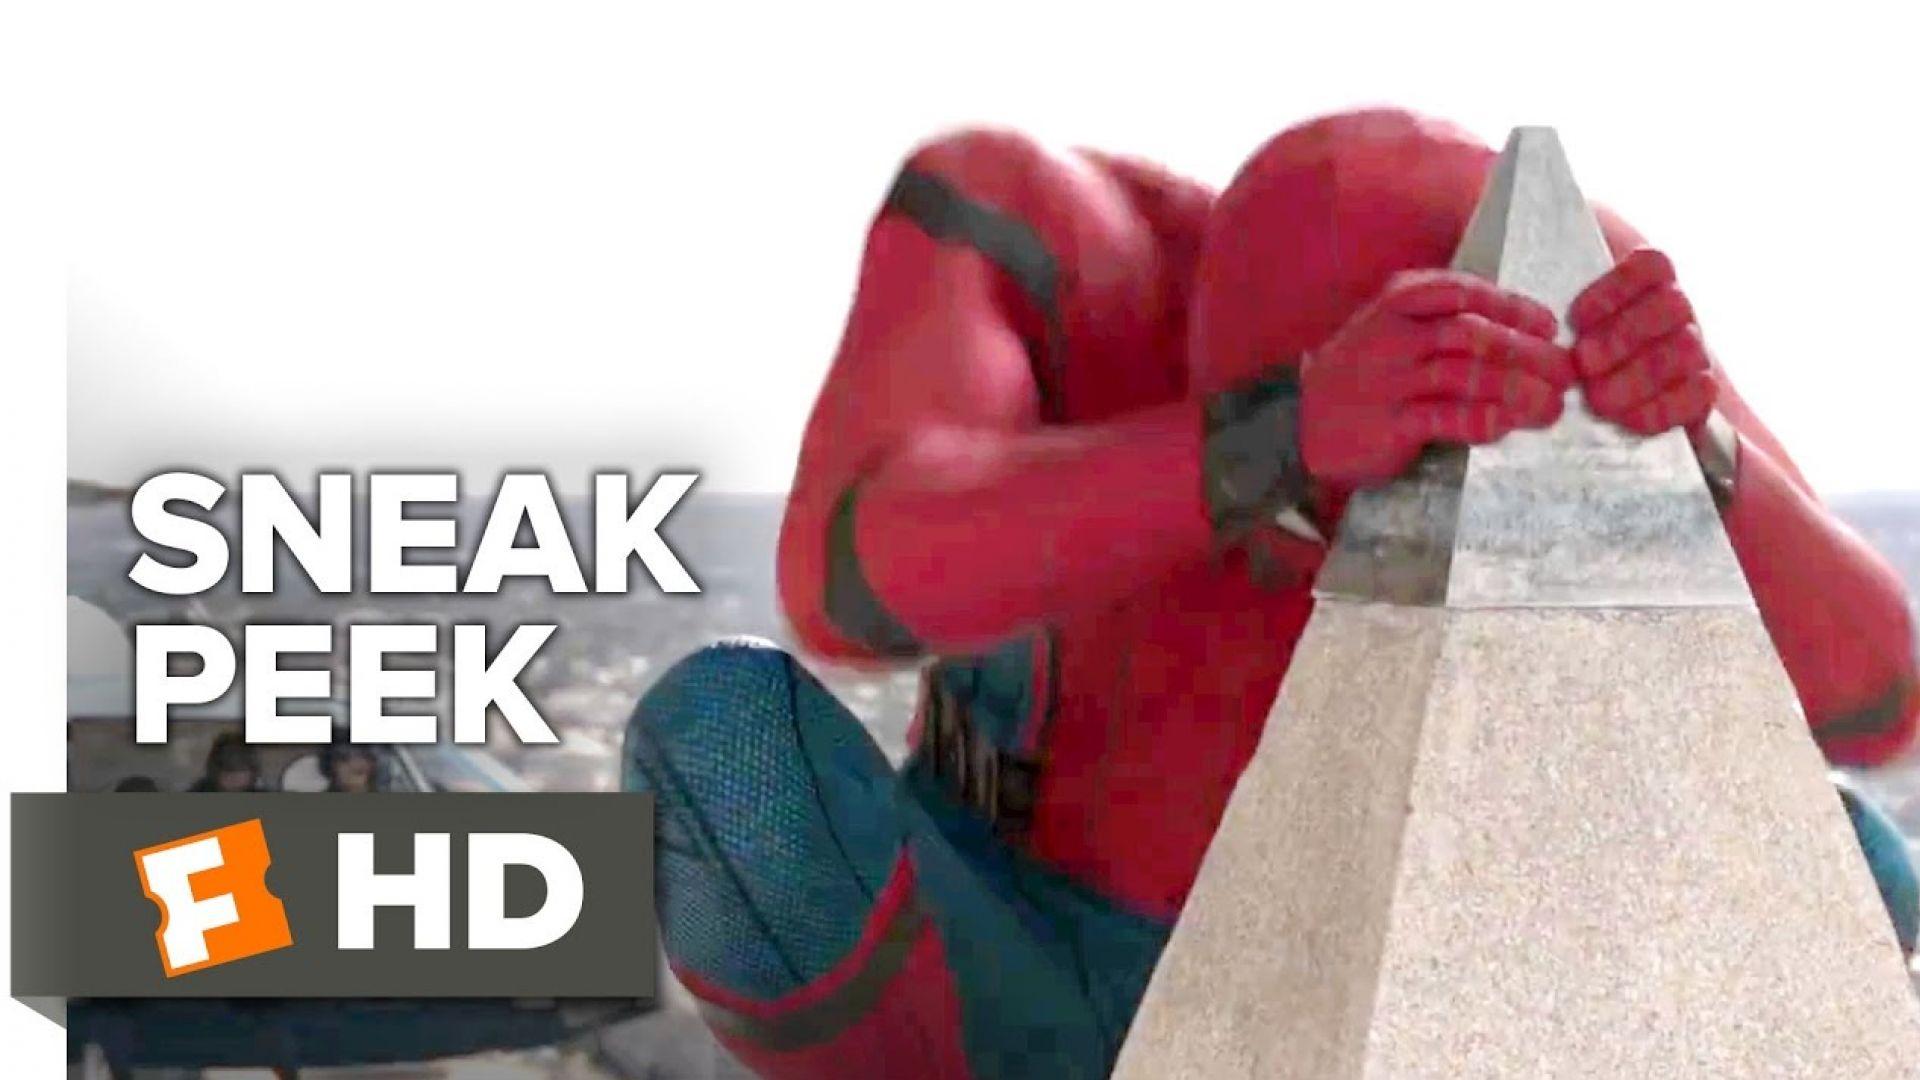 Sneak peek footage at Spider-Man: Homecoming ahead of first